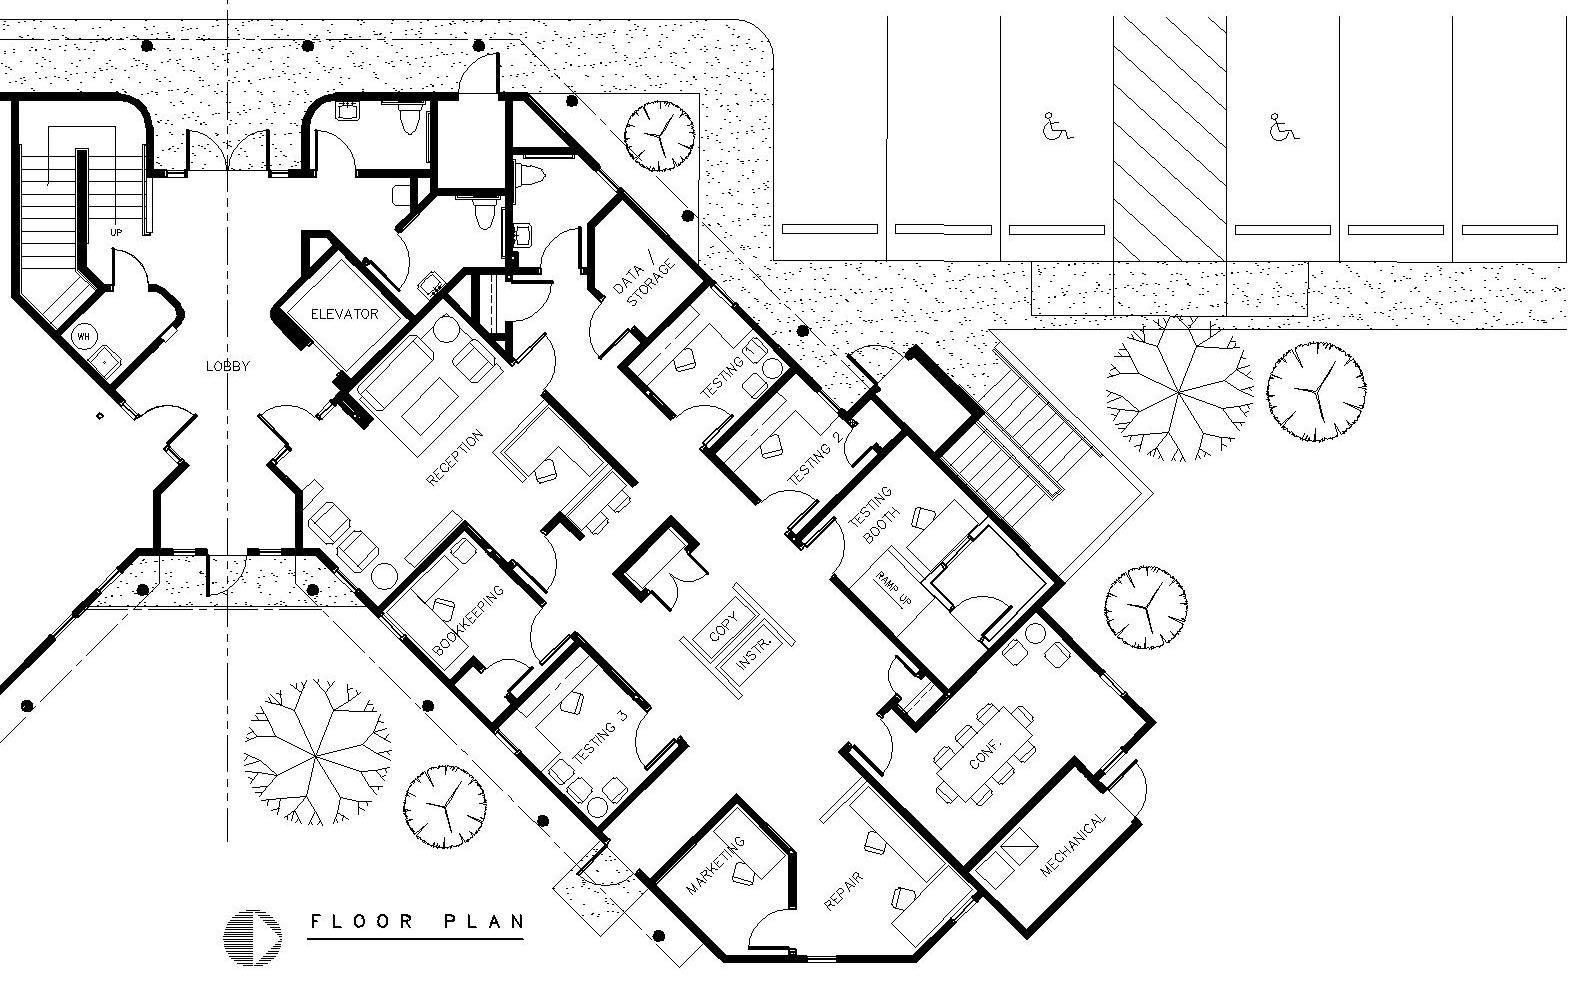 1579x1002 Uncategorized Treasure Trove Floor Plan Perky For Trendy Draw